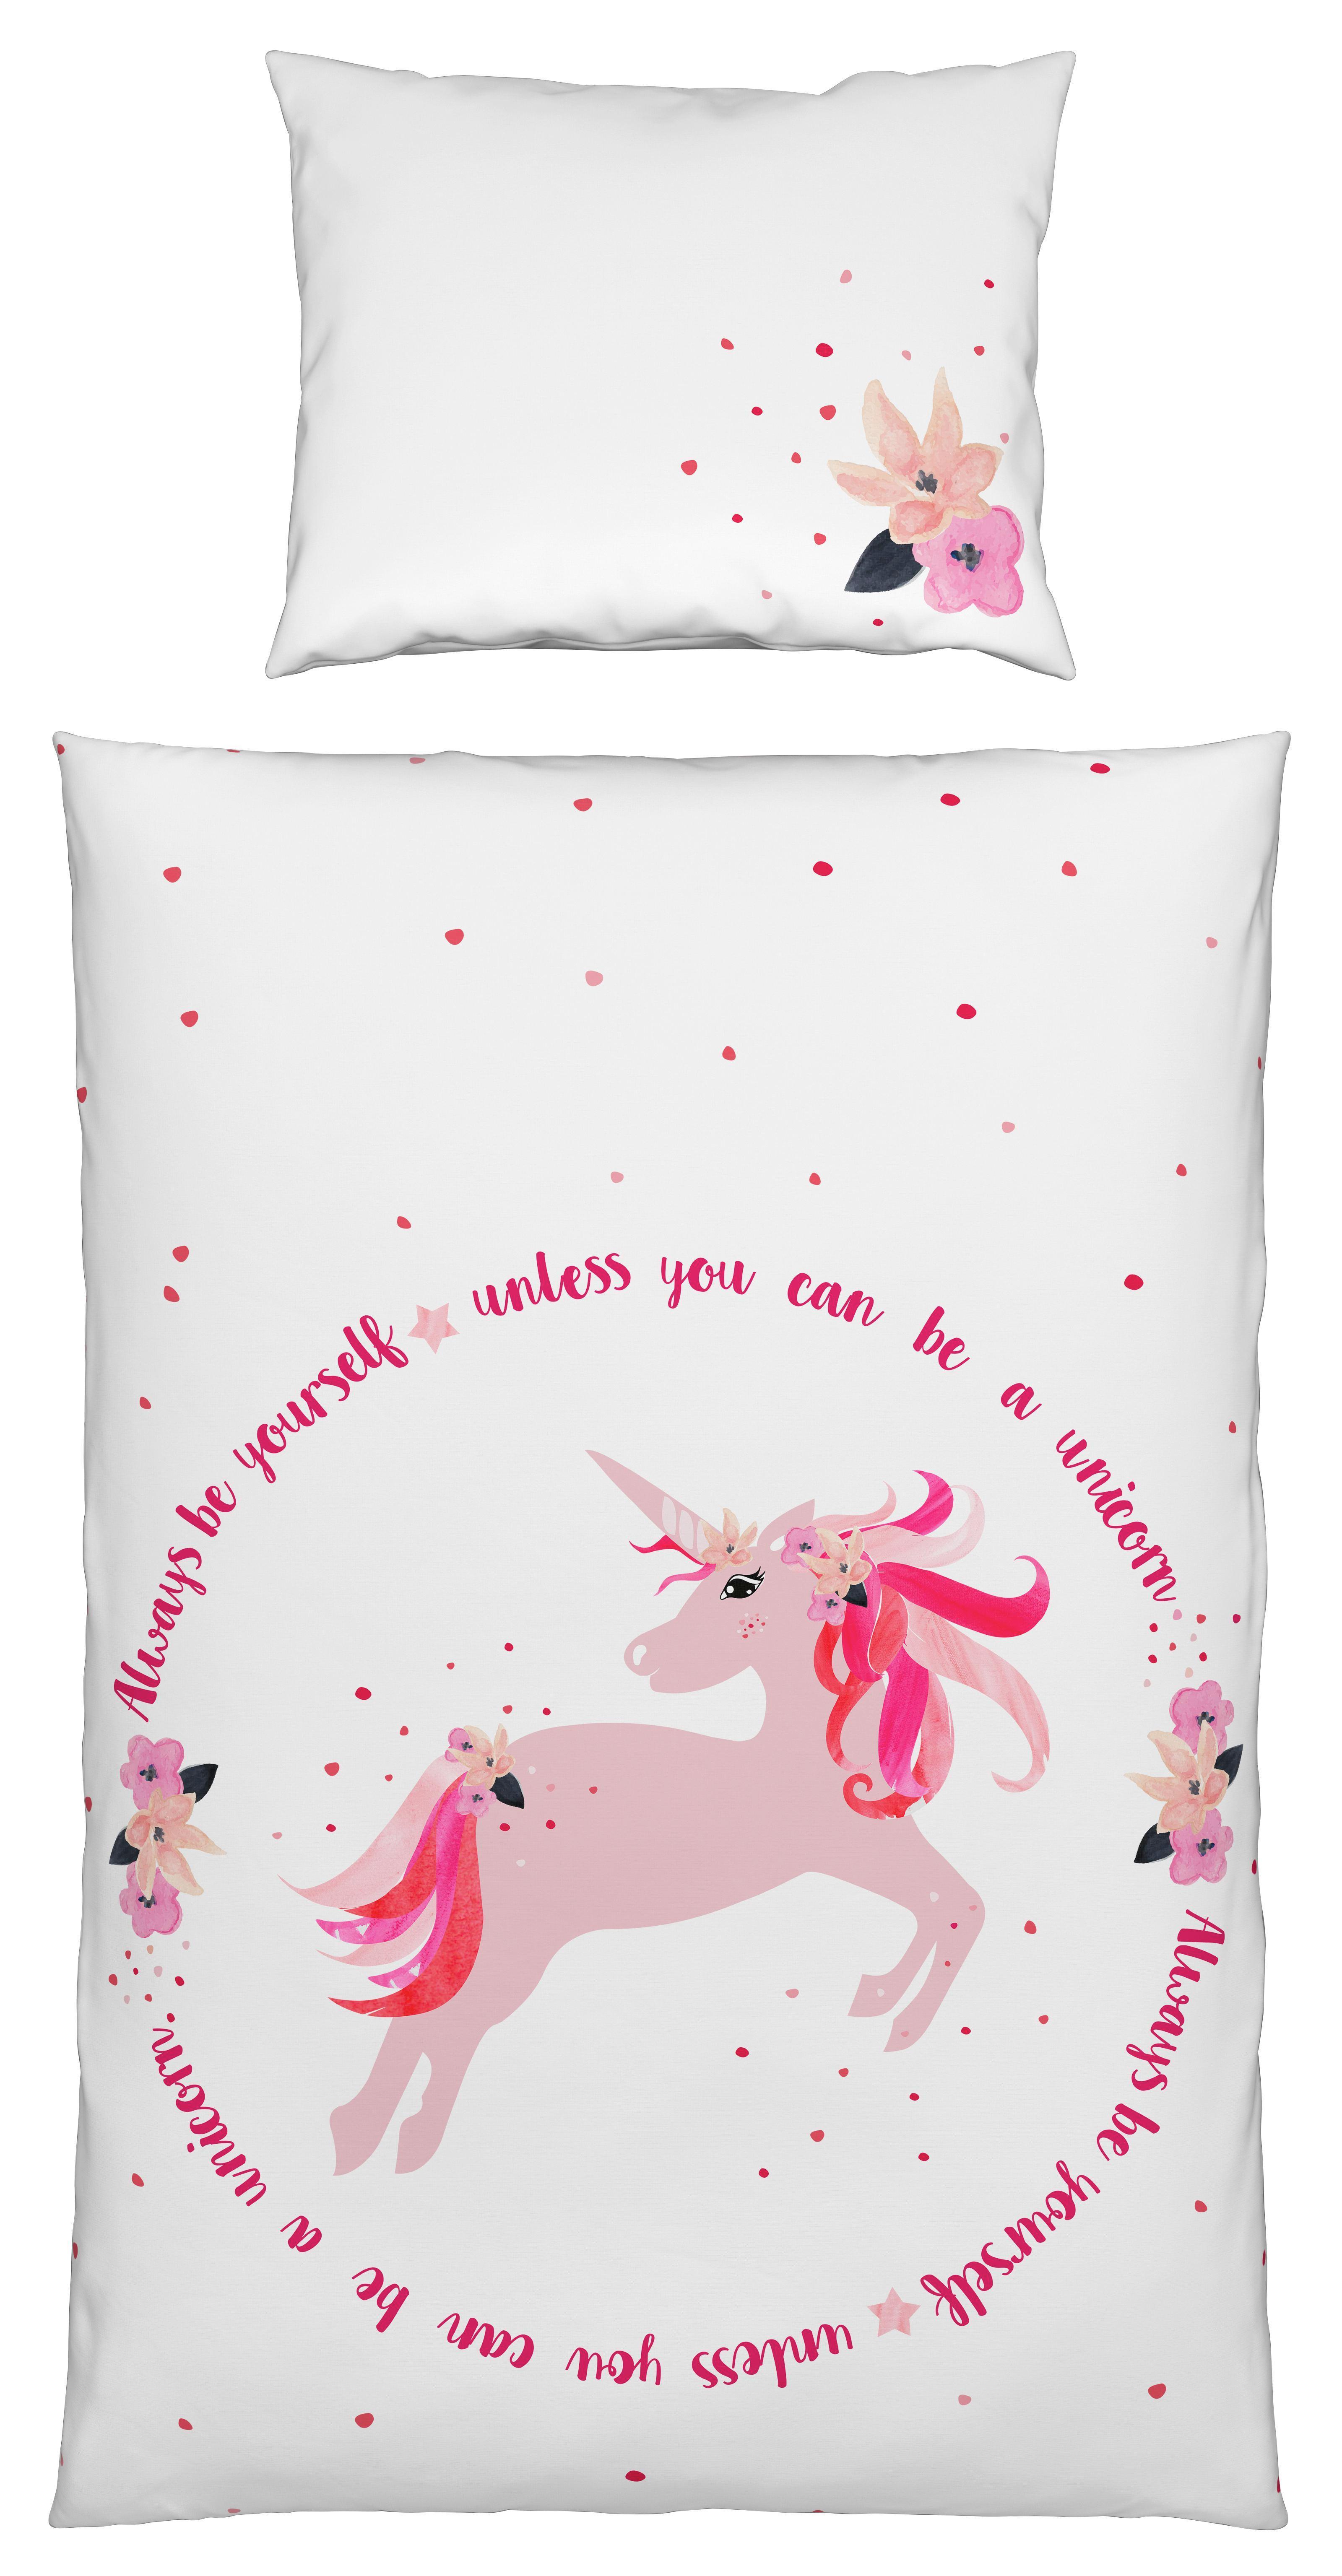 Bettwäsche Unicorn, ca. 140x200cm - Rosa/Weiß, LIFESTYLE, Textil - MÖMAX modern living